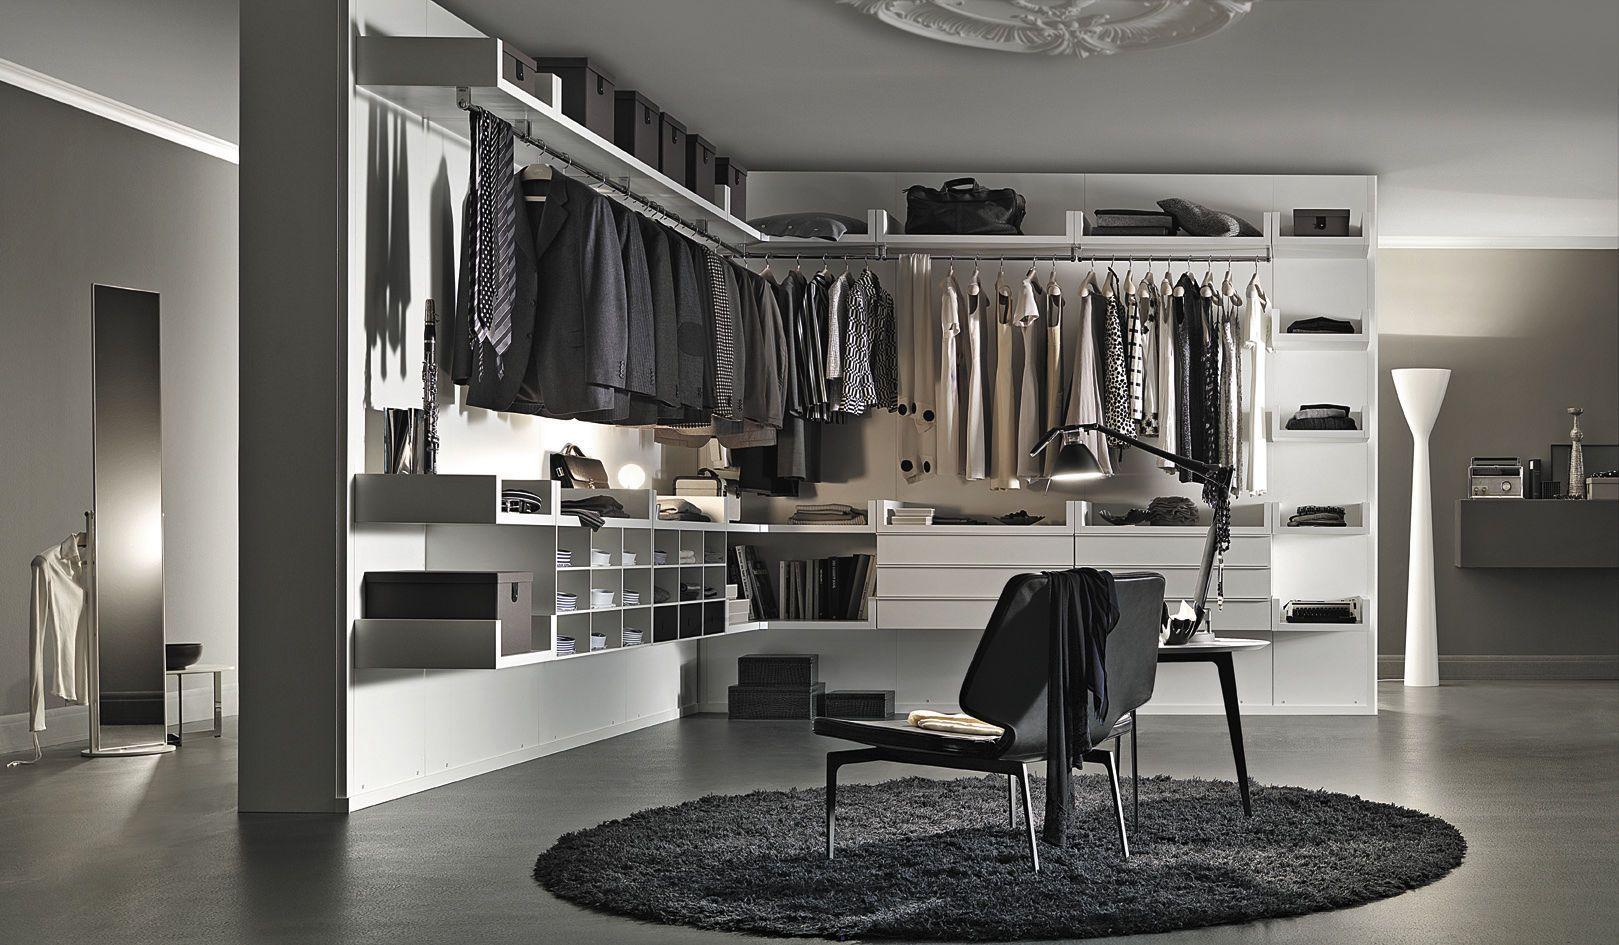 walk in closet design - google search | closet & shelving